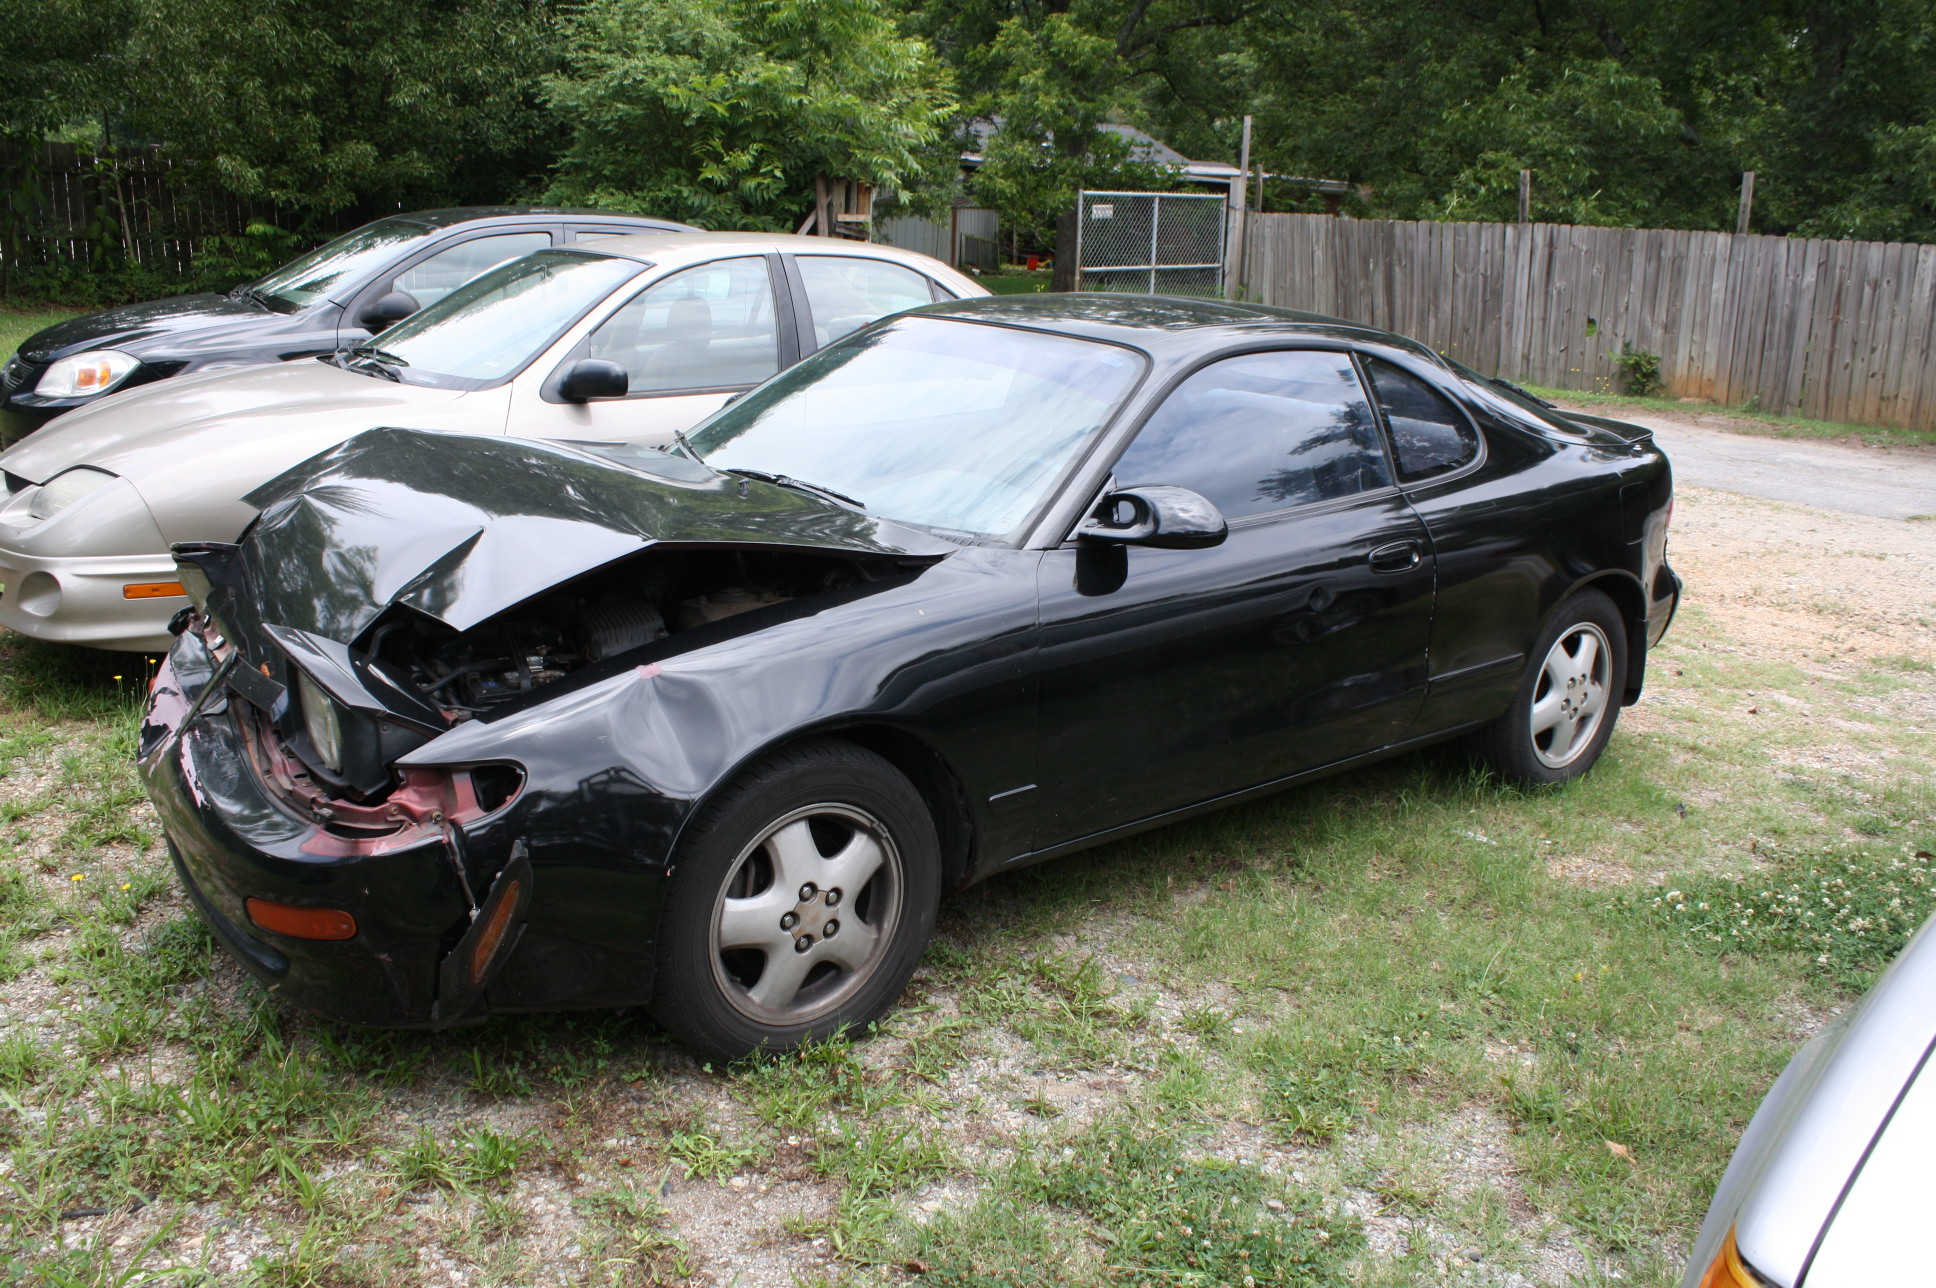 1993 Toyota Celica GT 2D Liftback - Car Appraisals & Claims